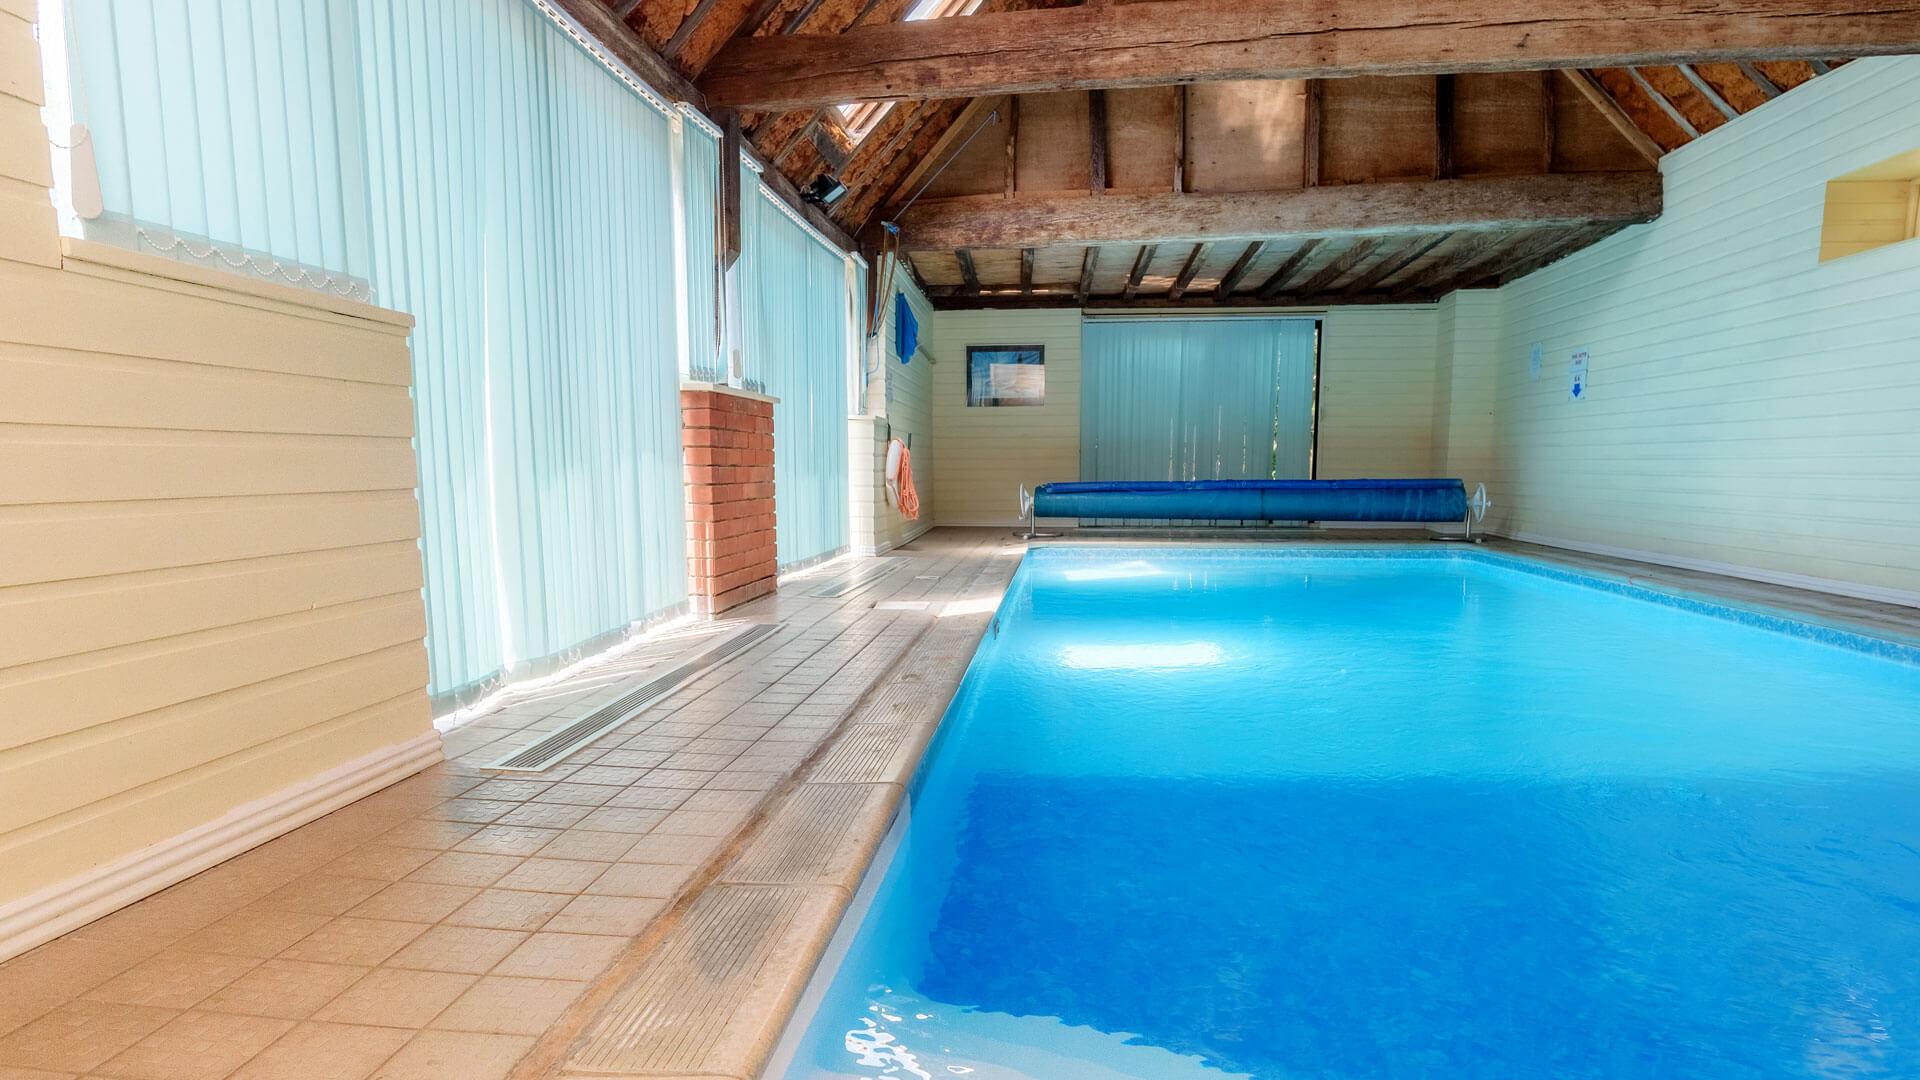 Kingfisher Barn Swimming Pool Abingdon Oxfordshire